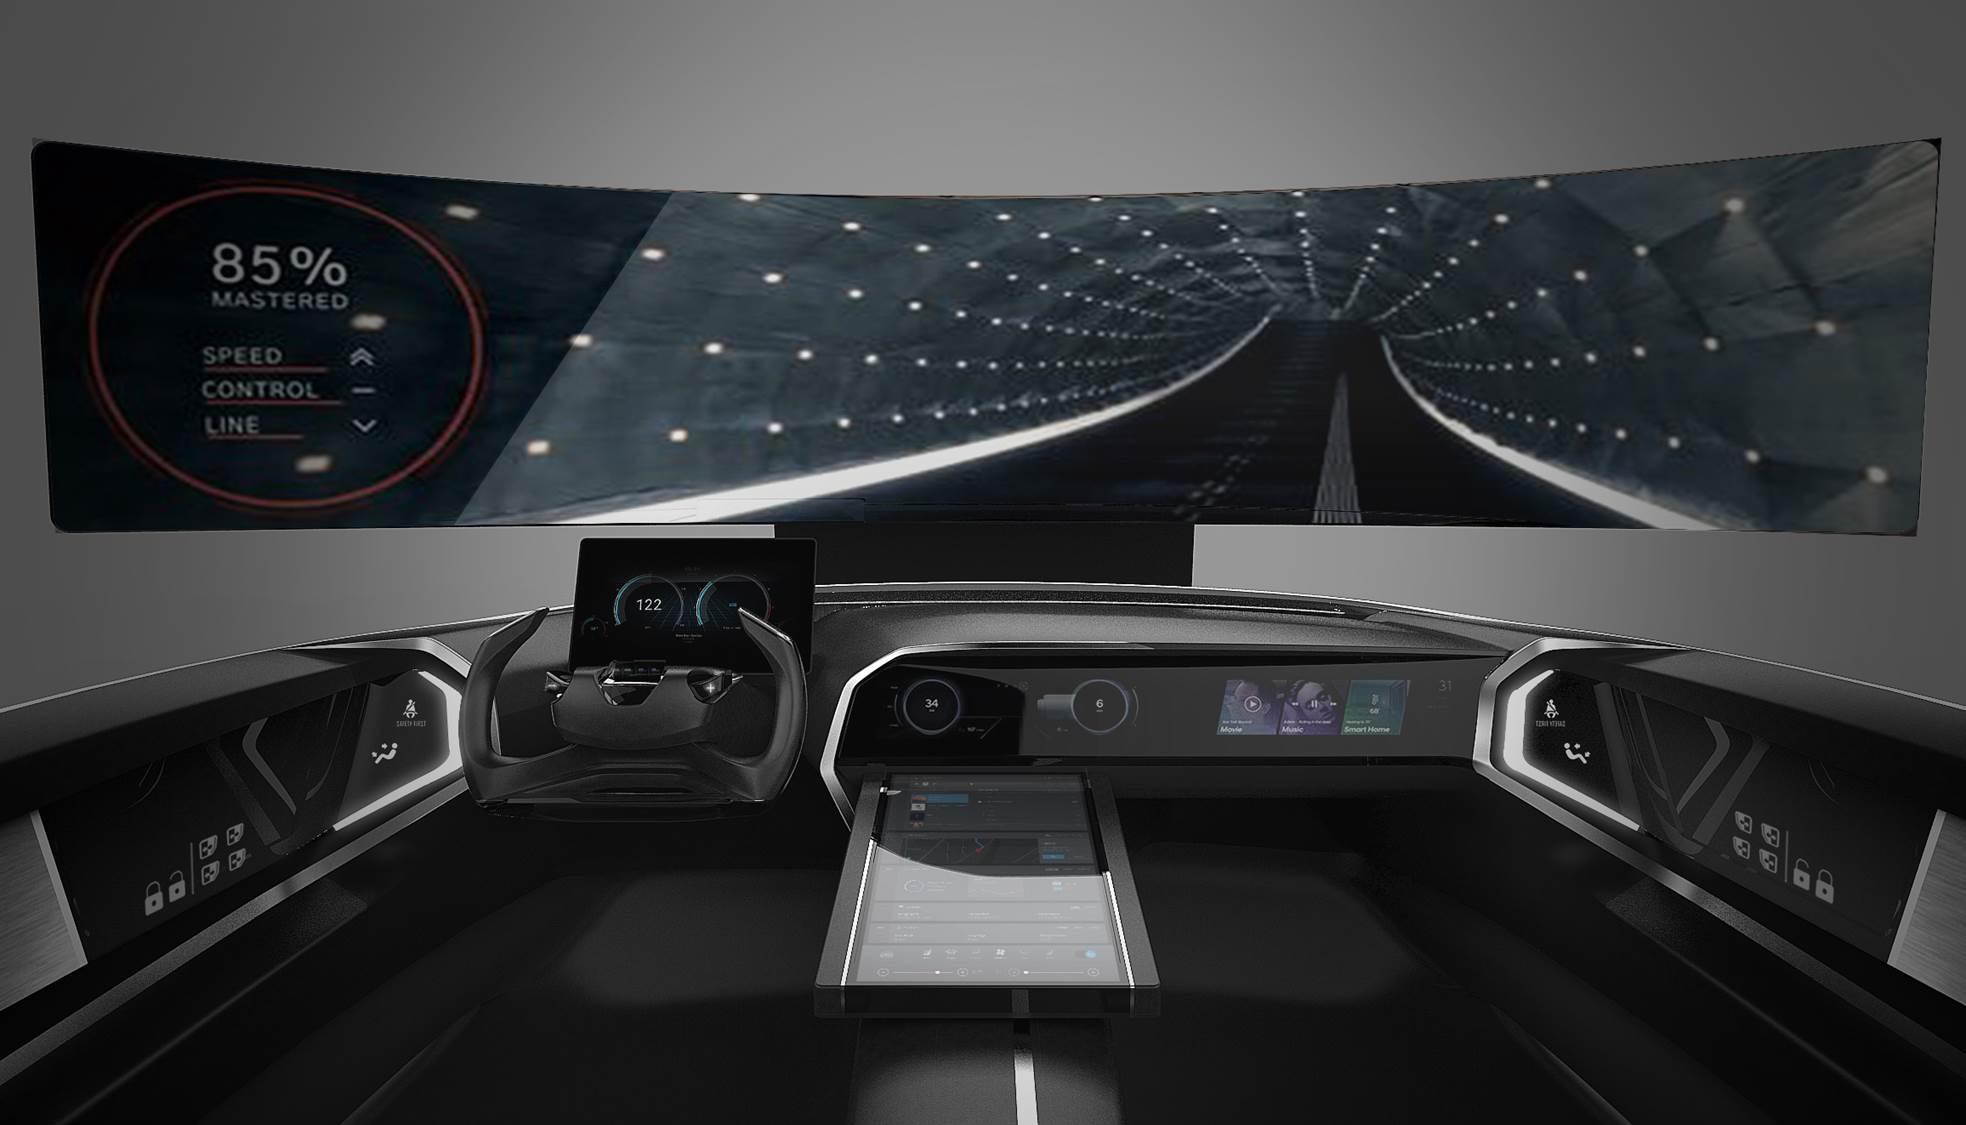 Kia Virtual Assistant Artificial Intelligence